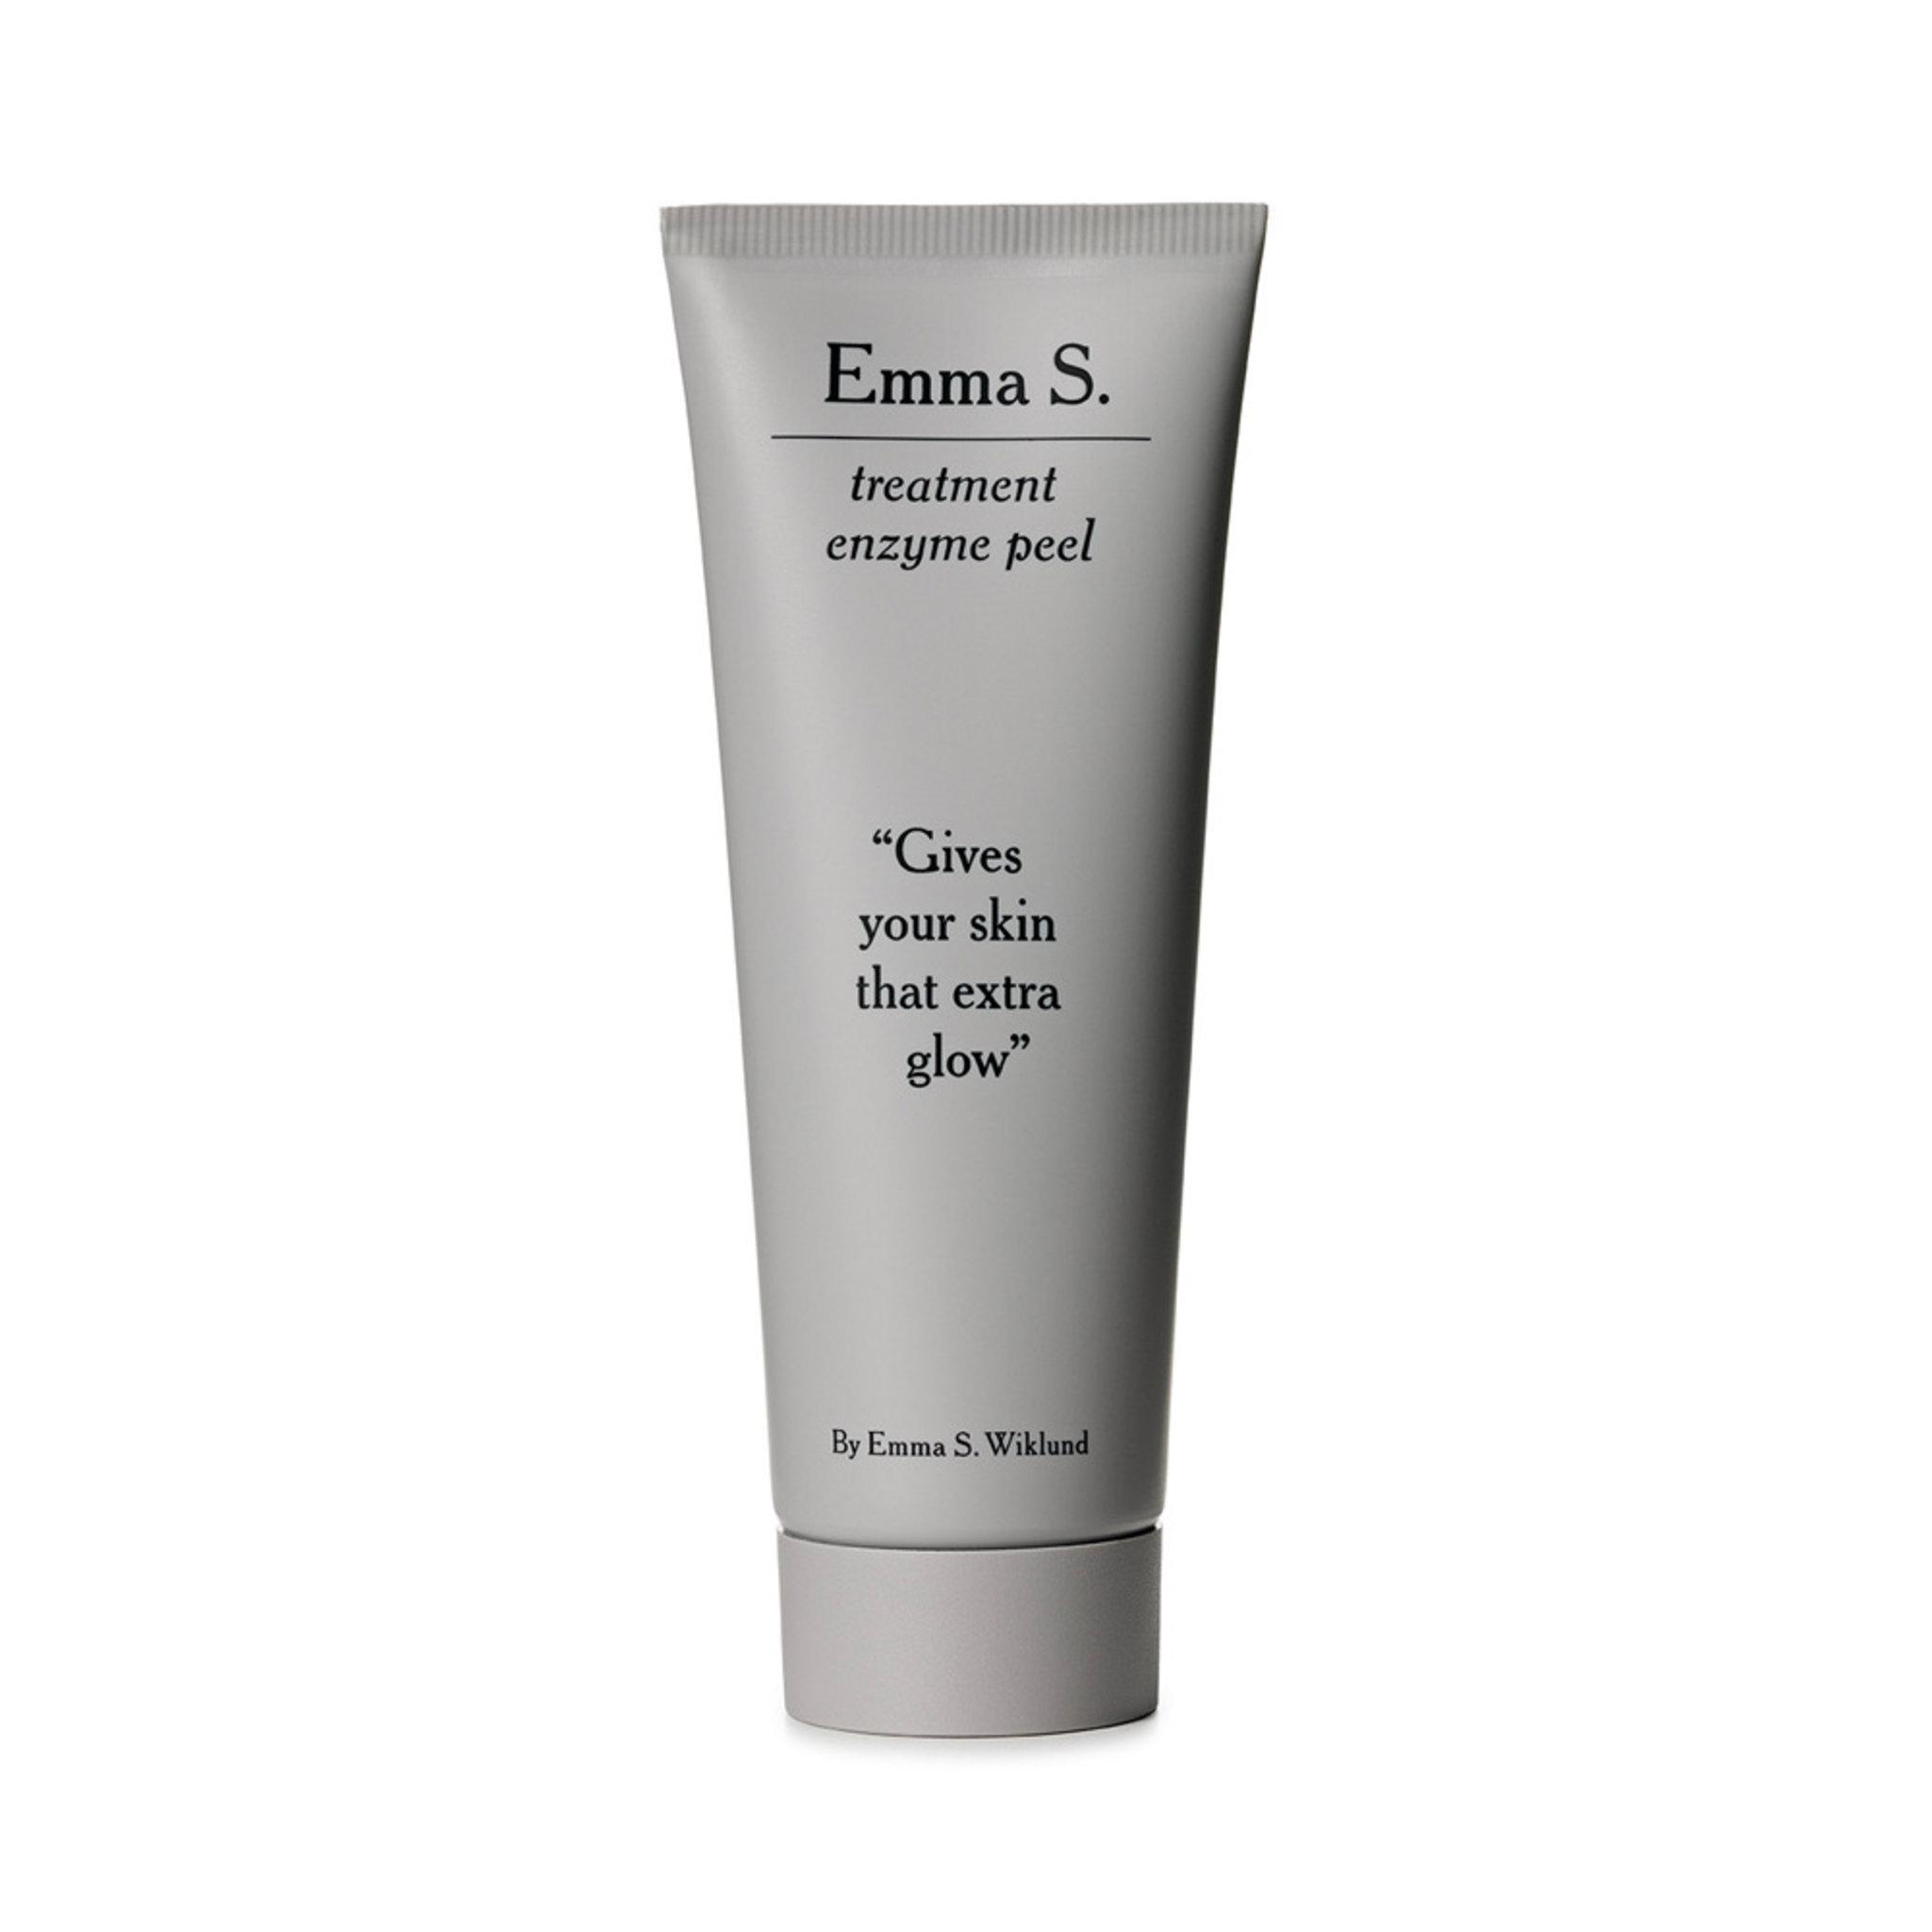 emma s enzyme peel recension